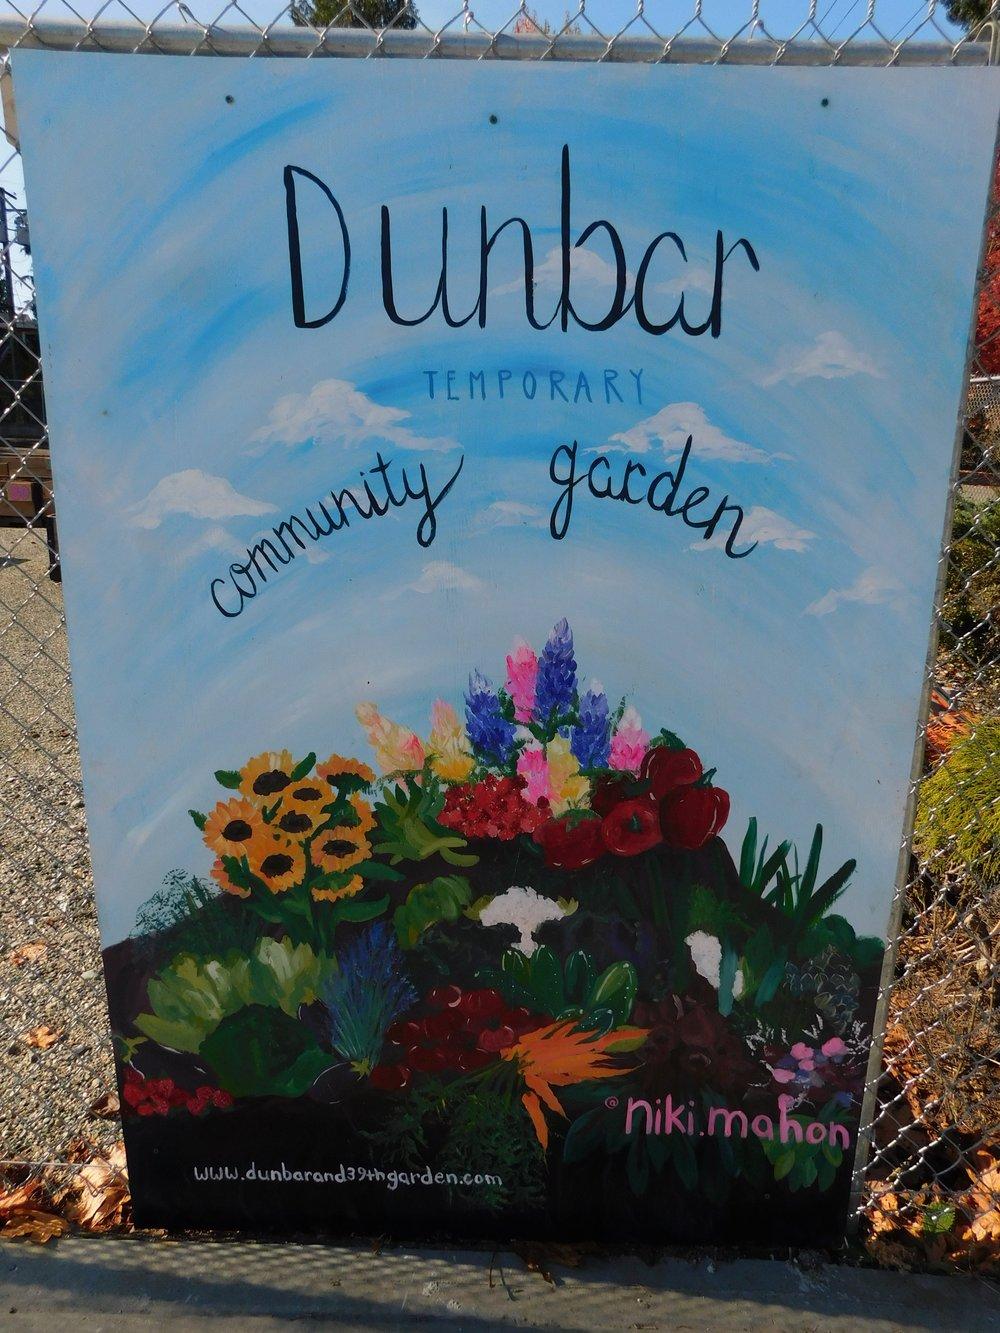 Dunbar_40th_Vancouver_Community_Garden_Builders-0018.JPG